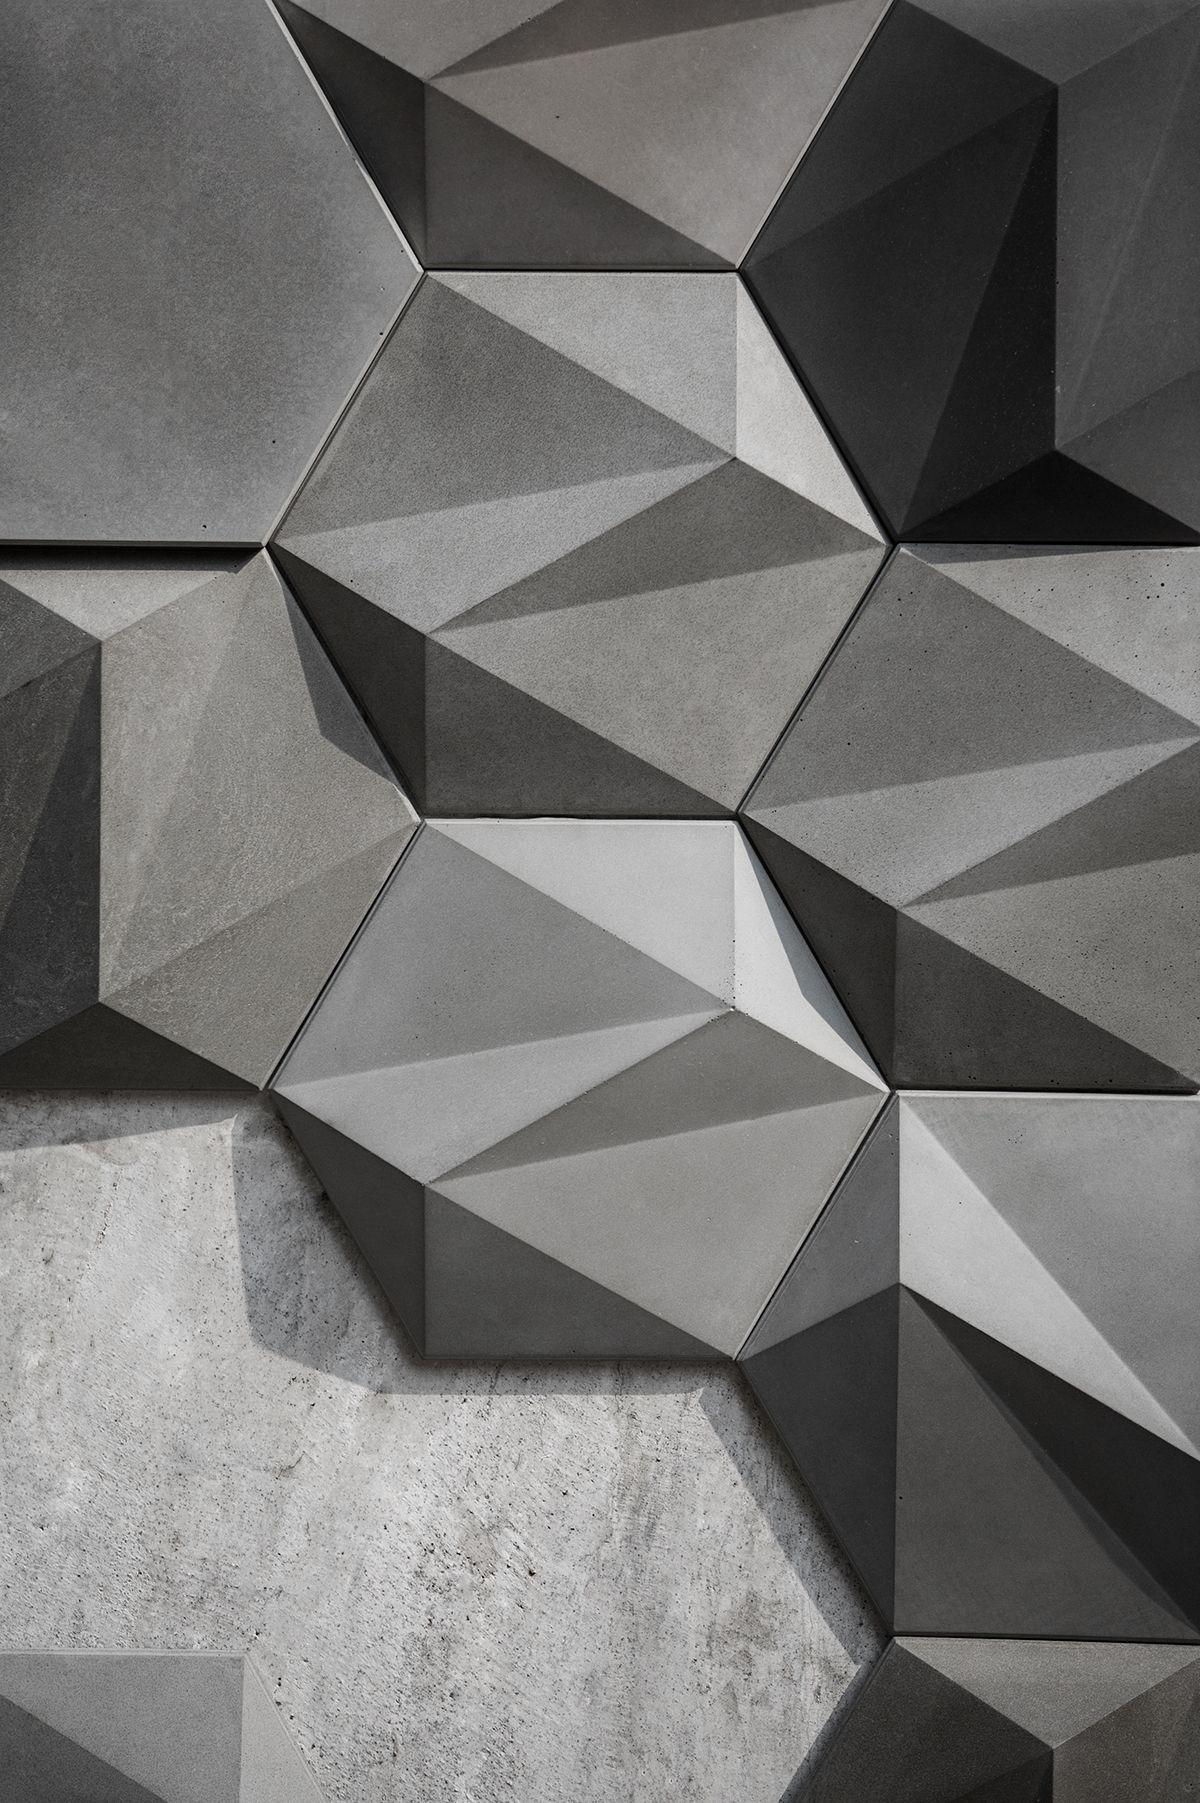 Concrete Wall Decoration